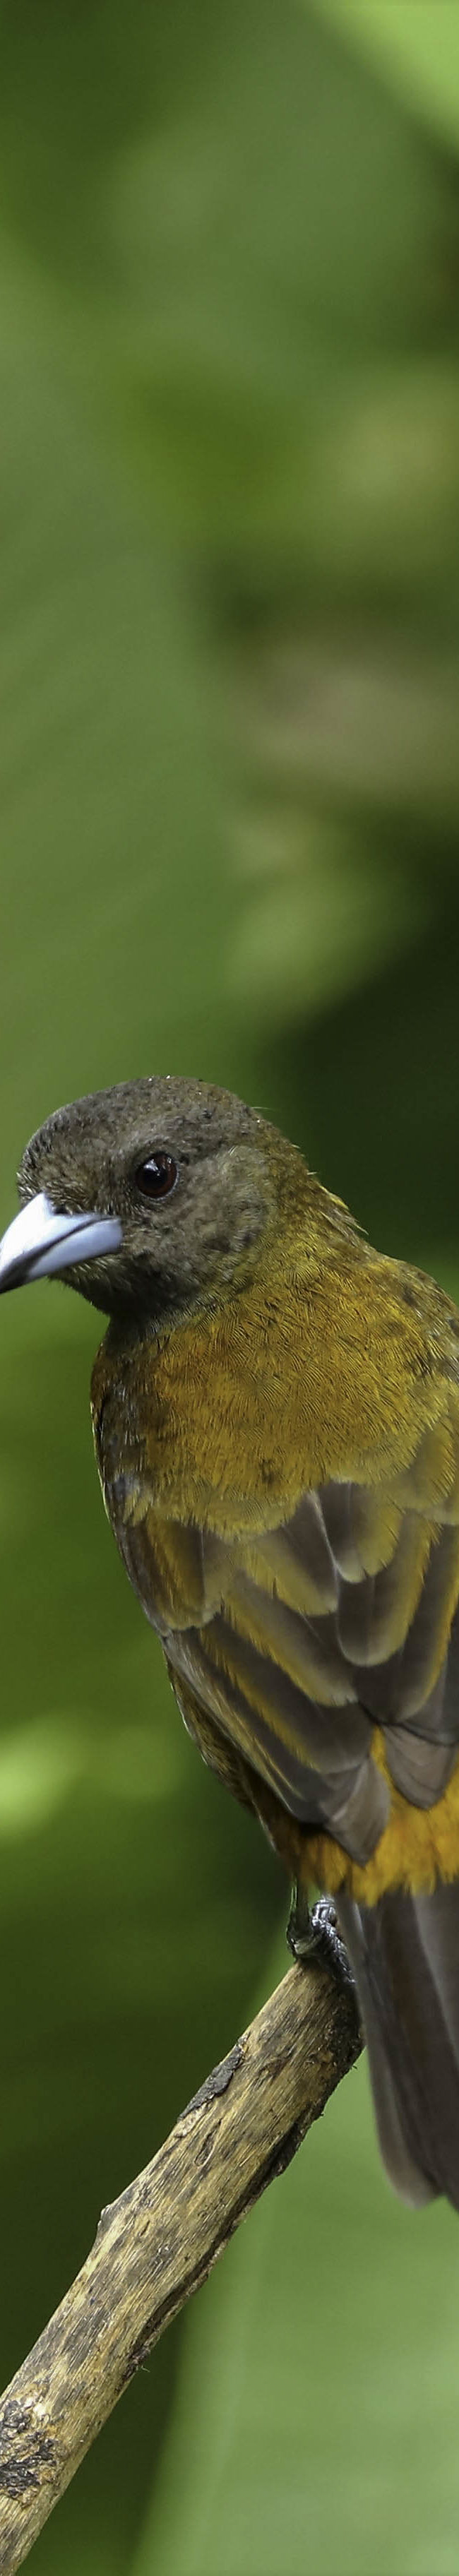 Roodrugtangare / Passerini's tanager (Ramphocelus passerinii) (female)